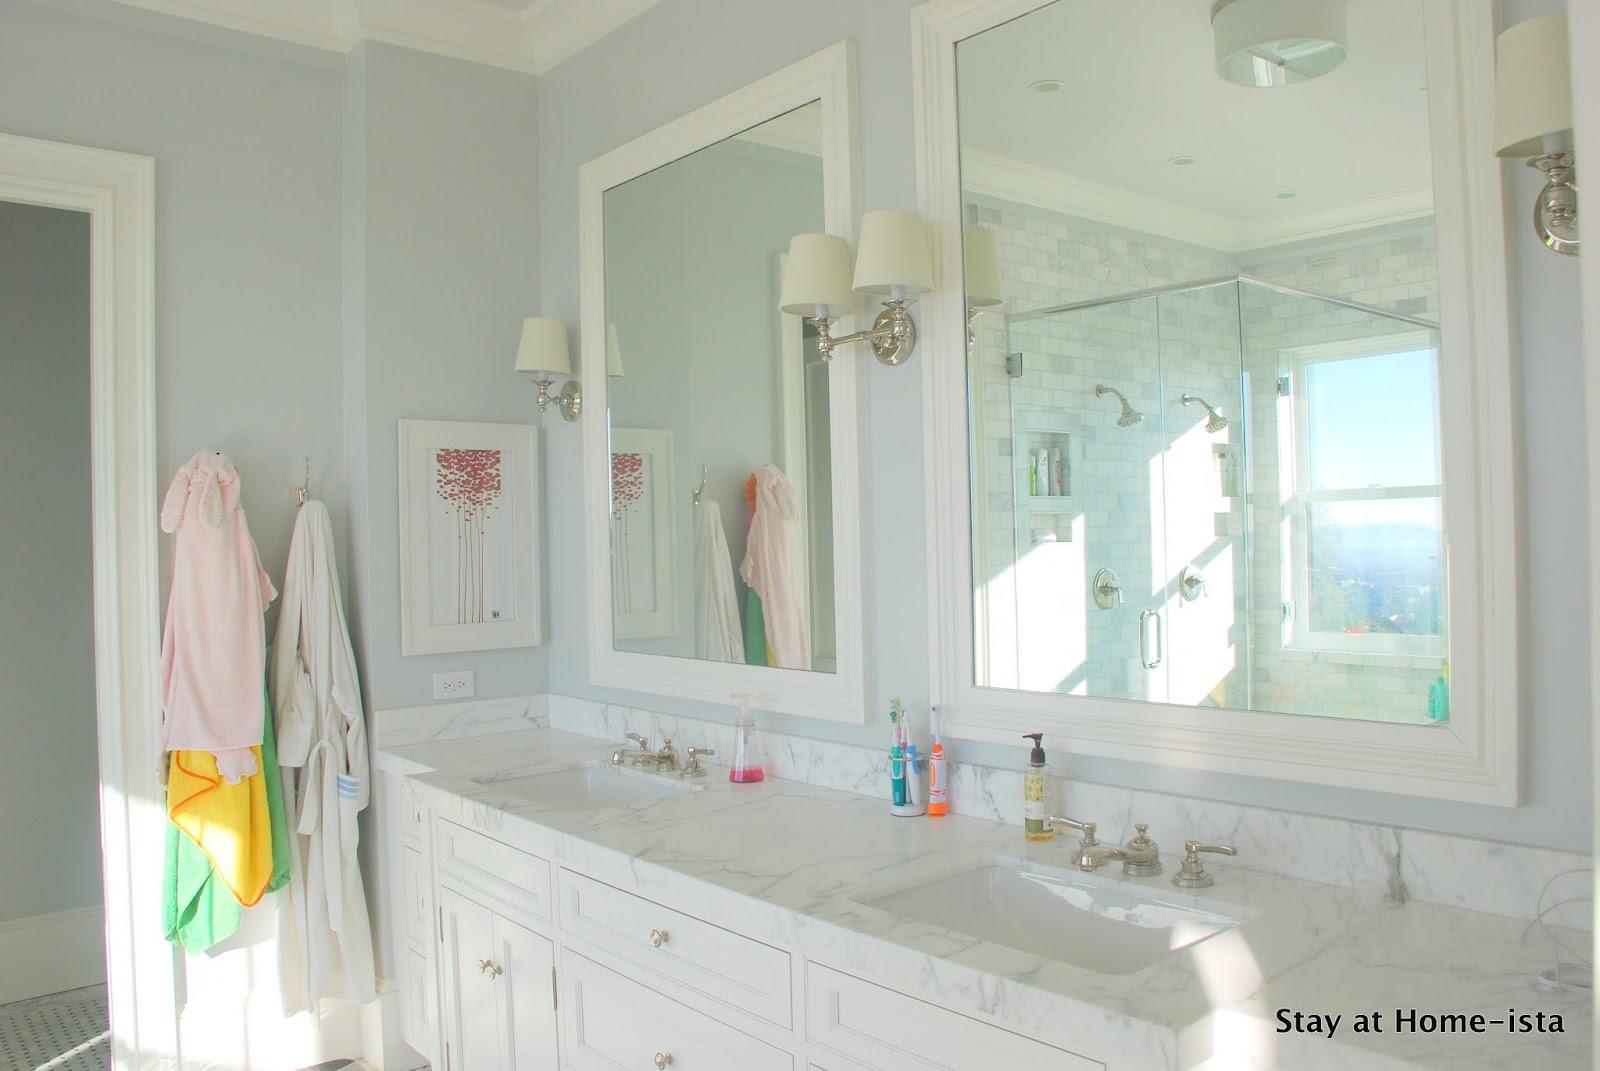 Remodelaholic | Marble Master Bathroom Dream Come True